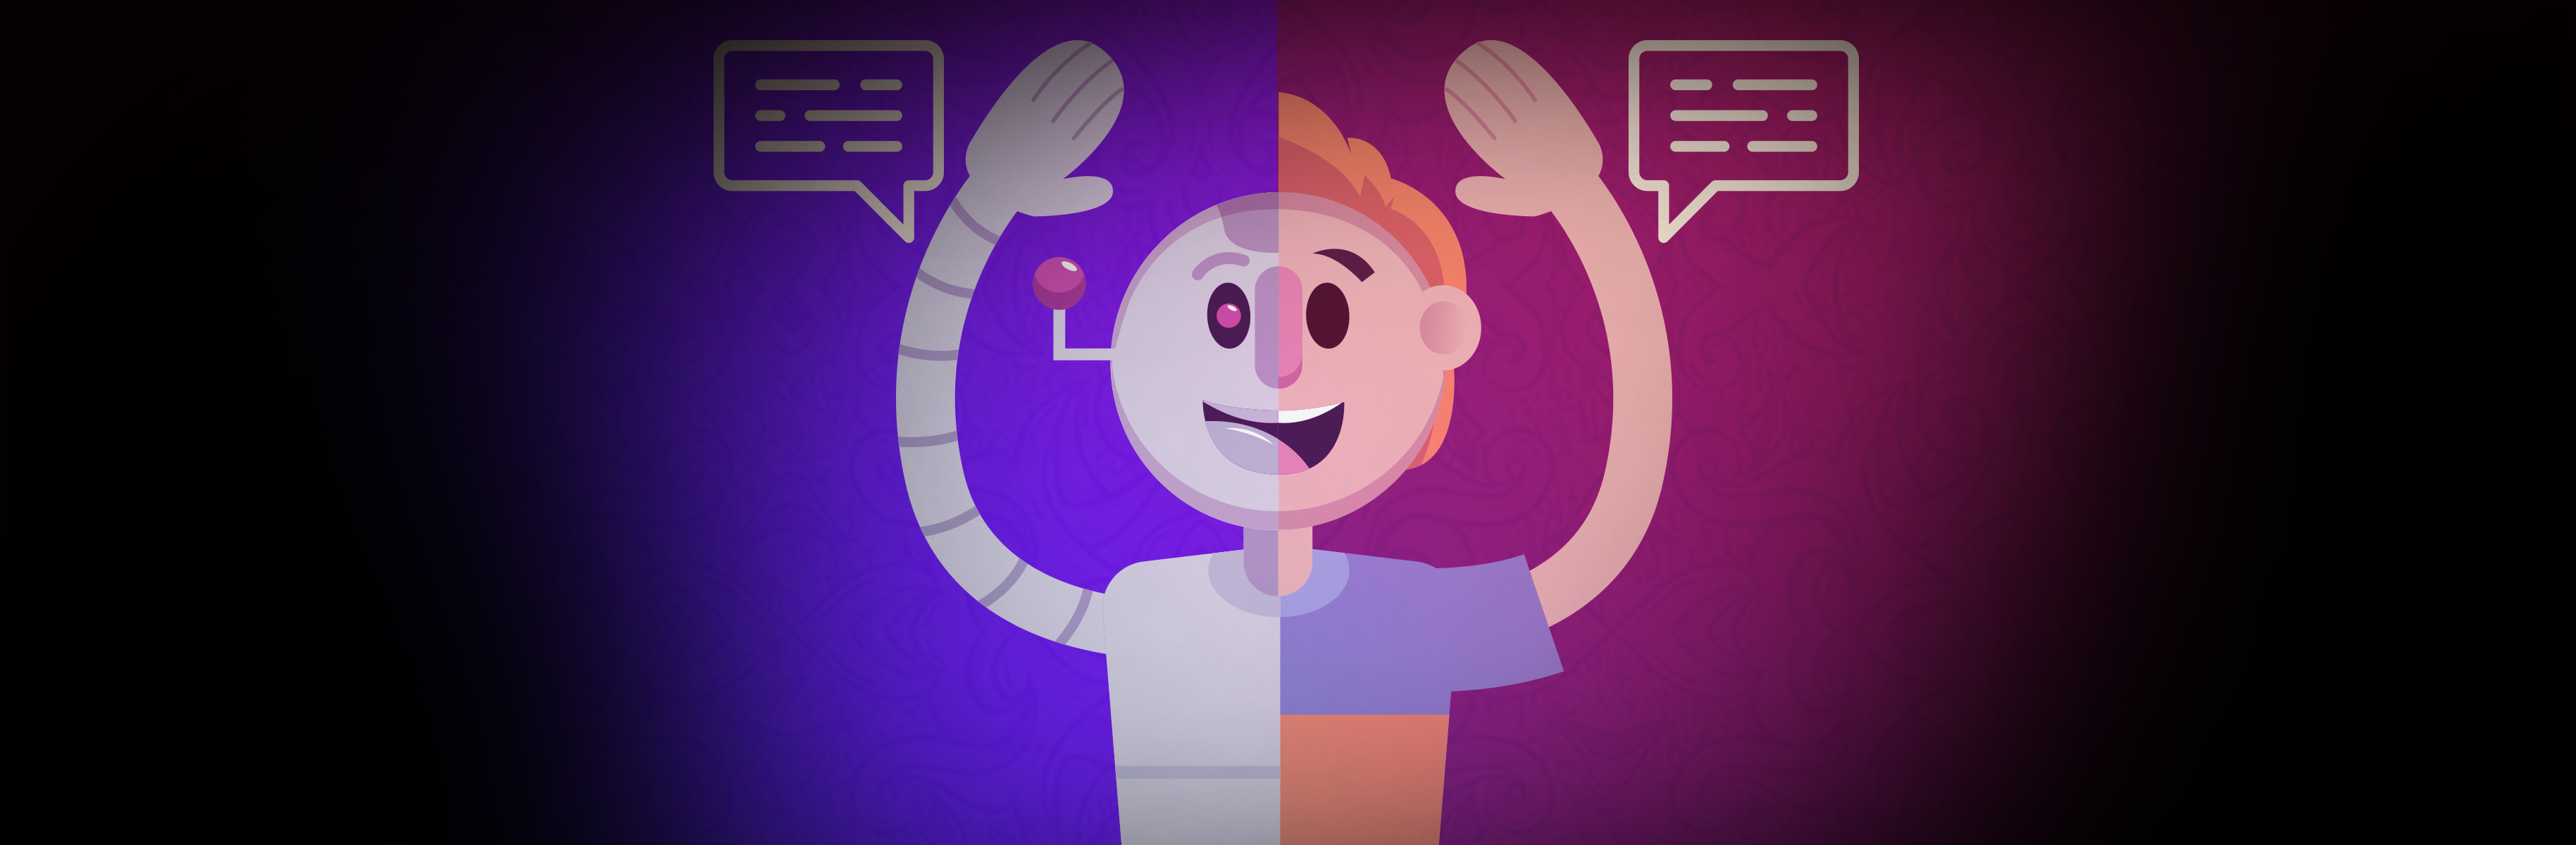 Bot vs. Atendimento Humano: qual a dose certa?